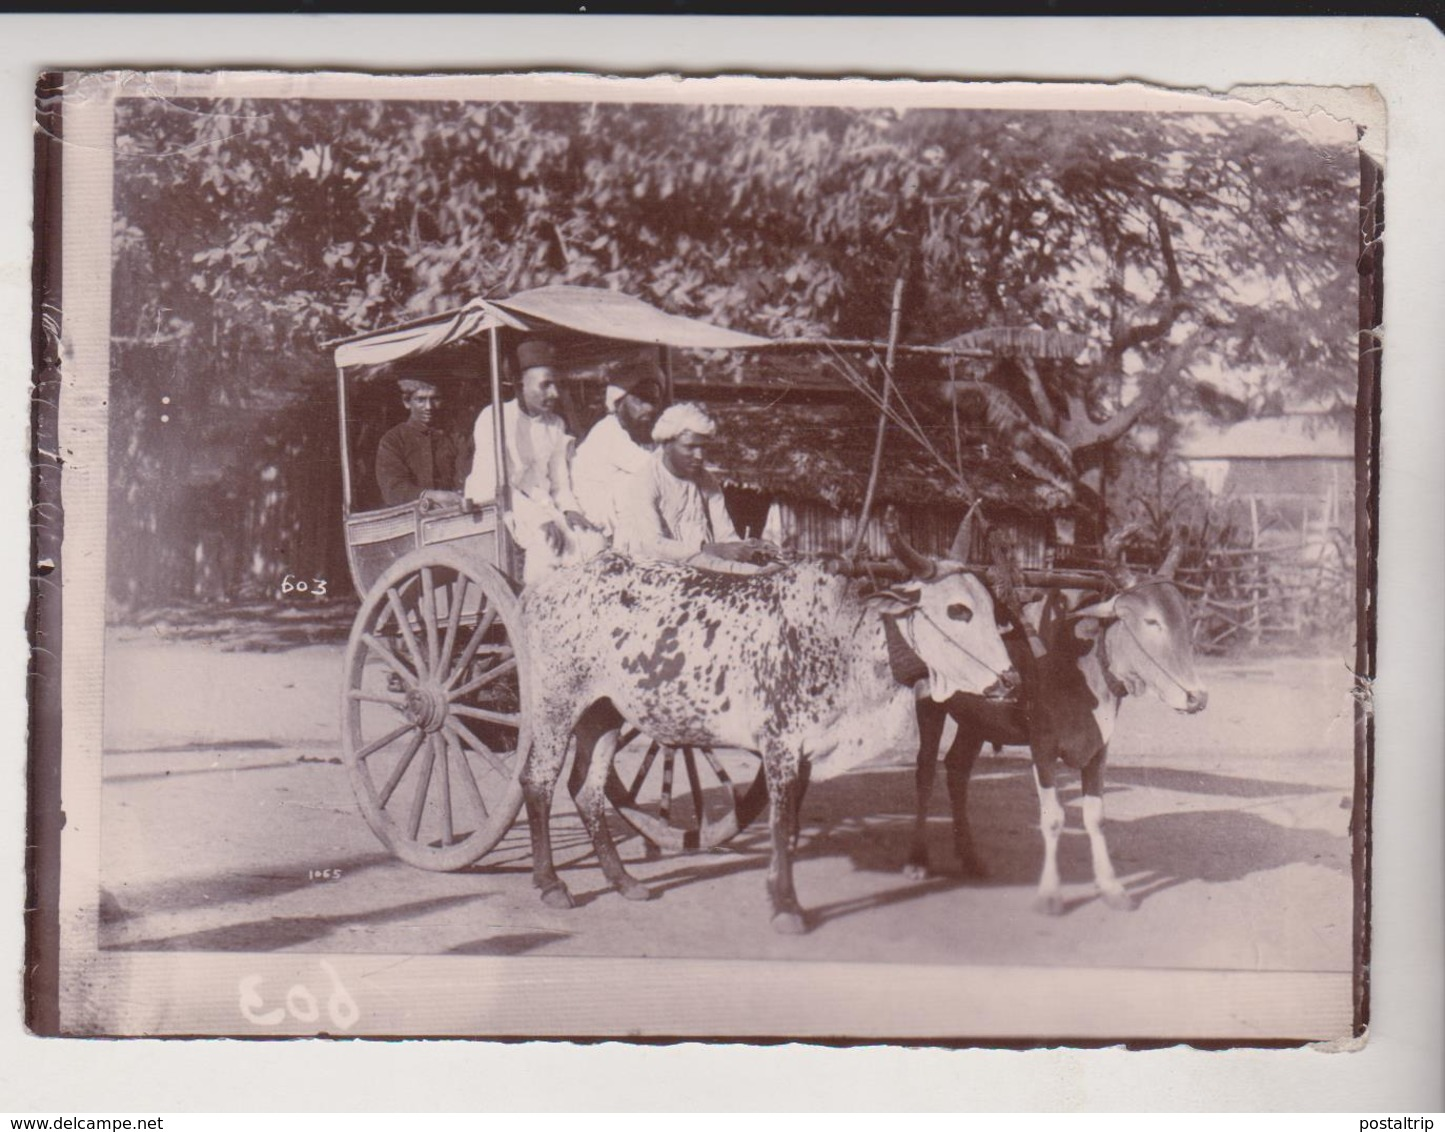 INDO CHINE ASIA  11*8 CM Fonds Victor FORBIN 1864-1947 - Fotos